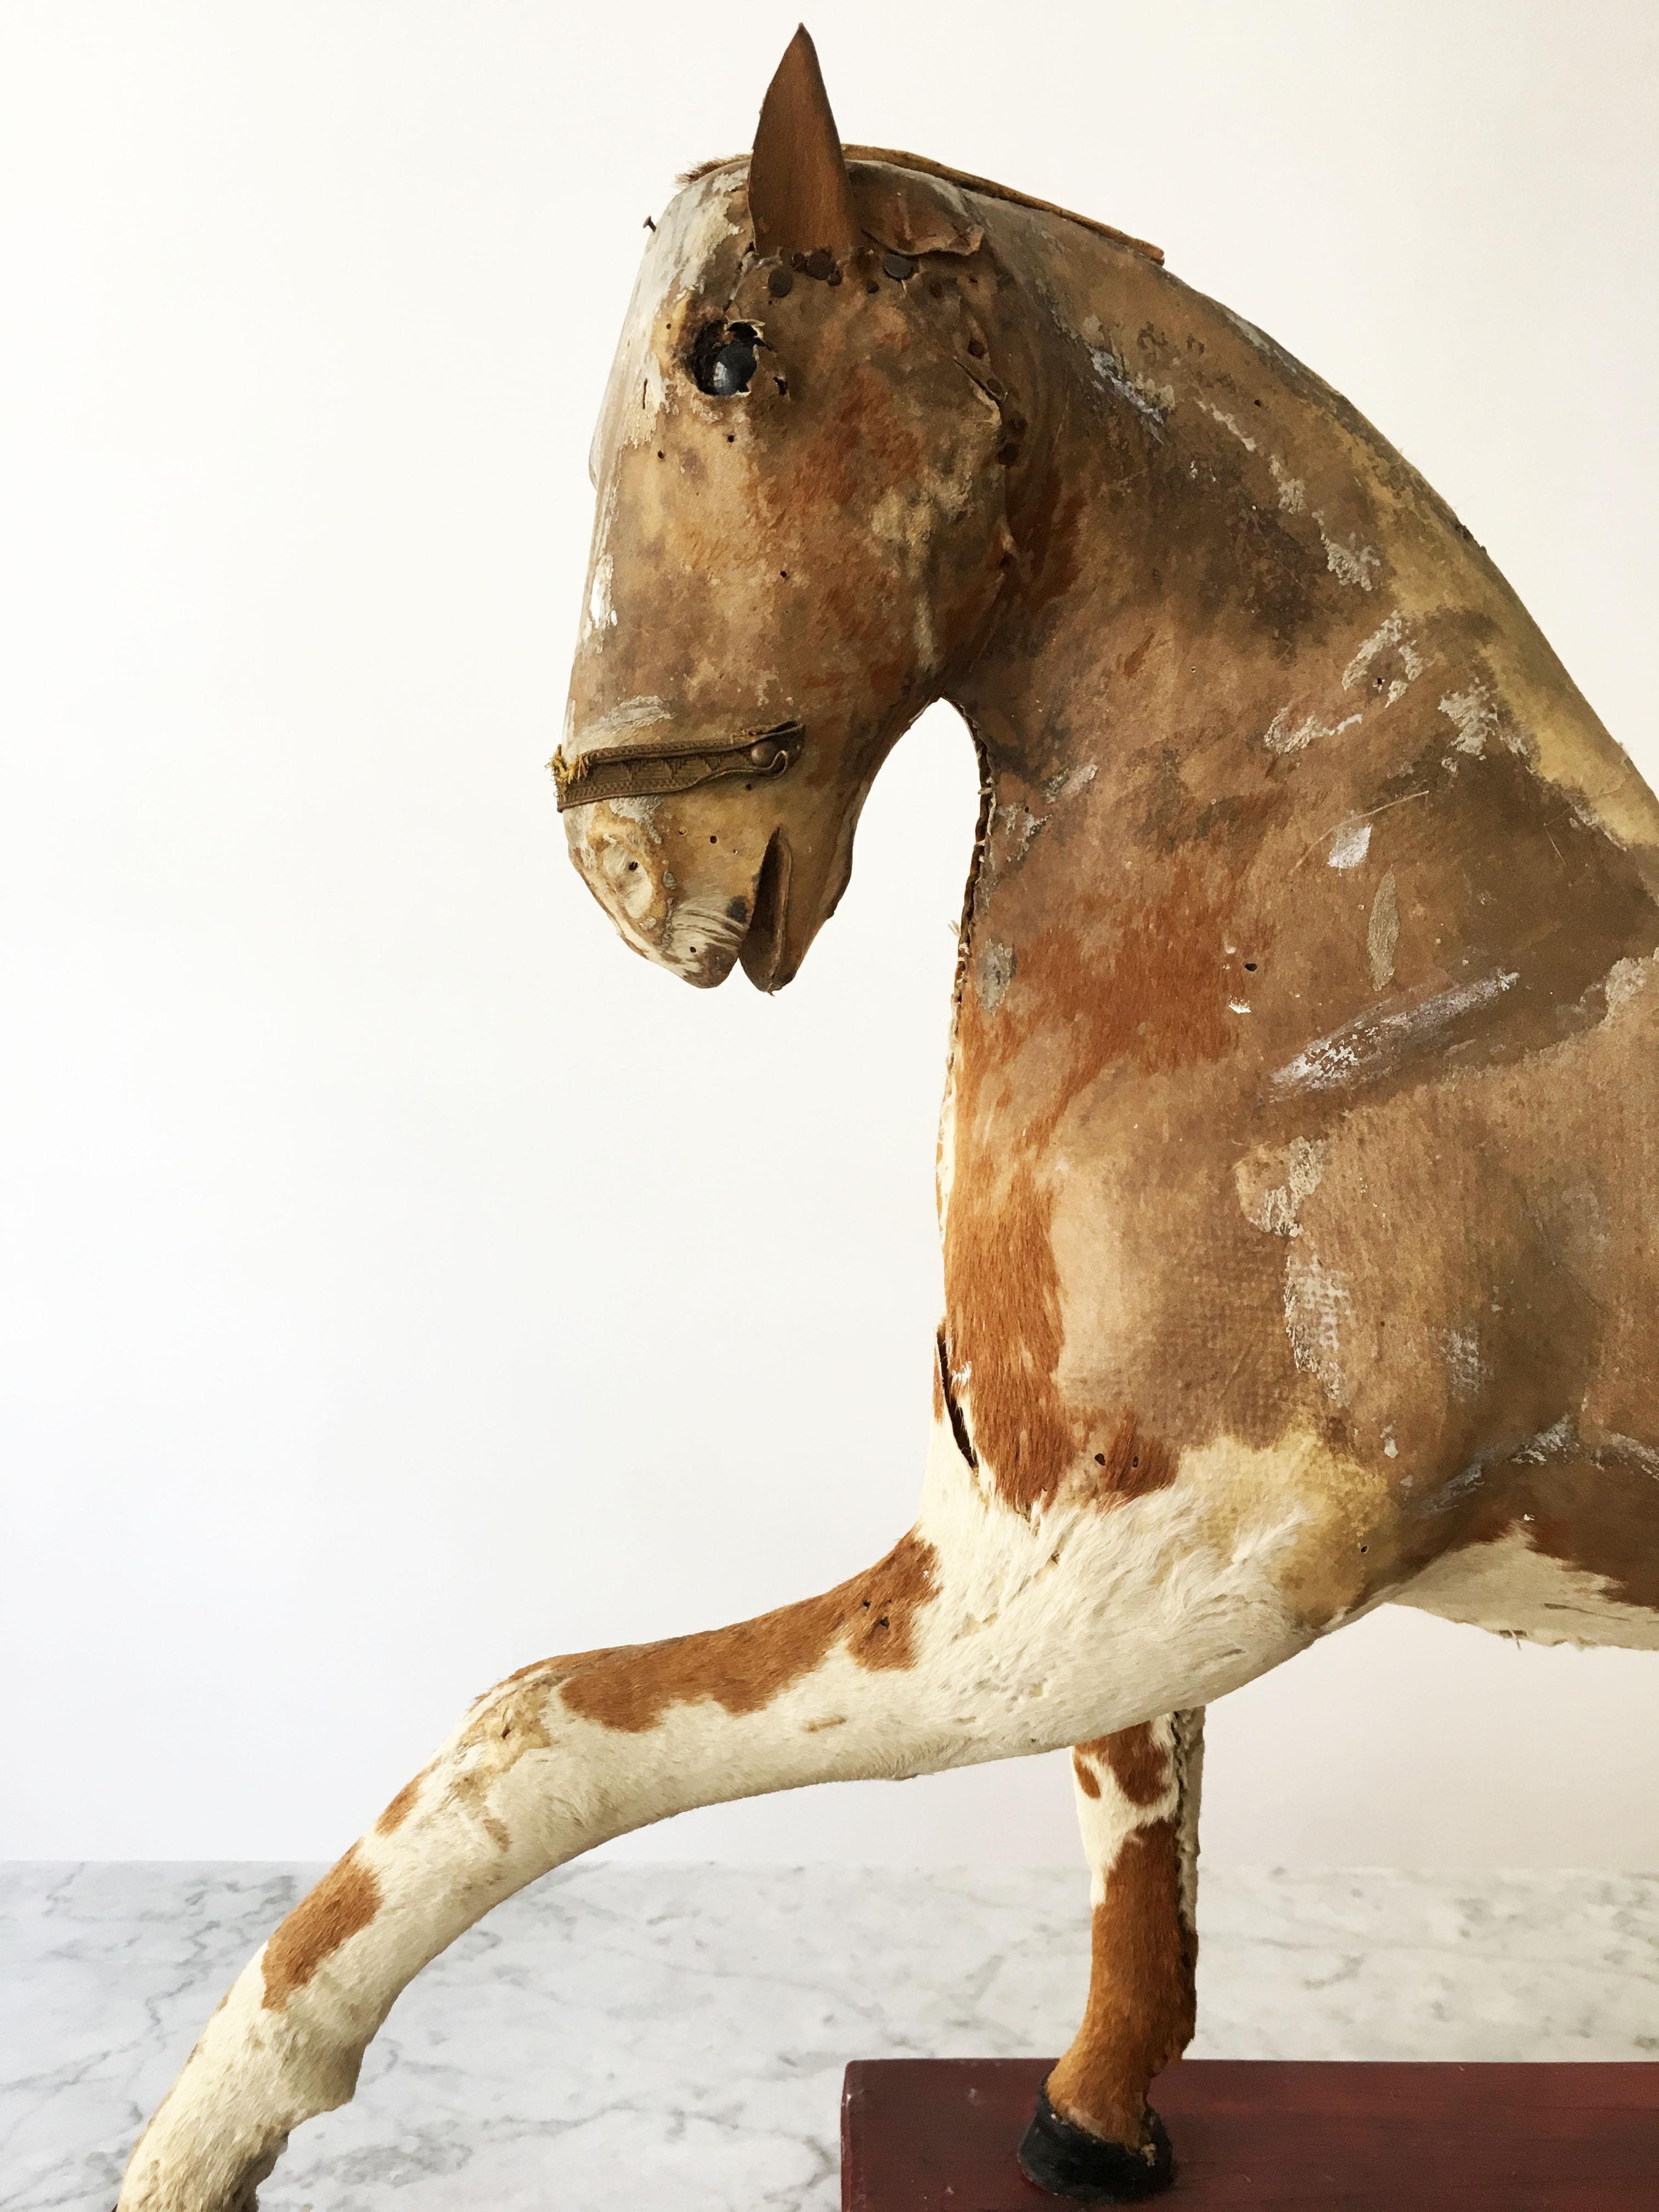 Primitive Modern Horse Sculpture Historical Toy Austria 1920s At 1stdibs